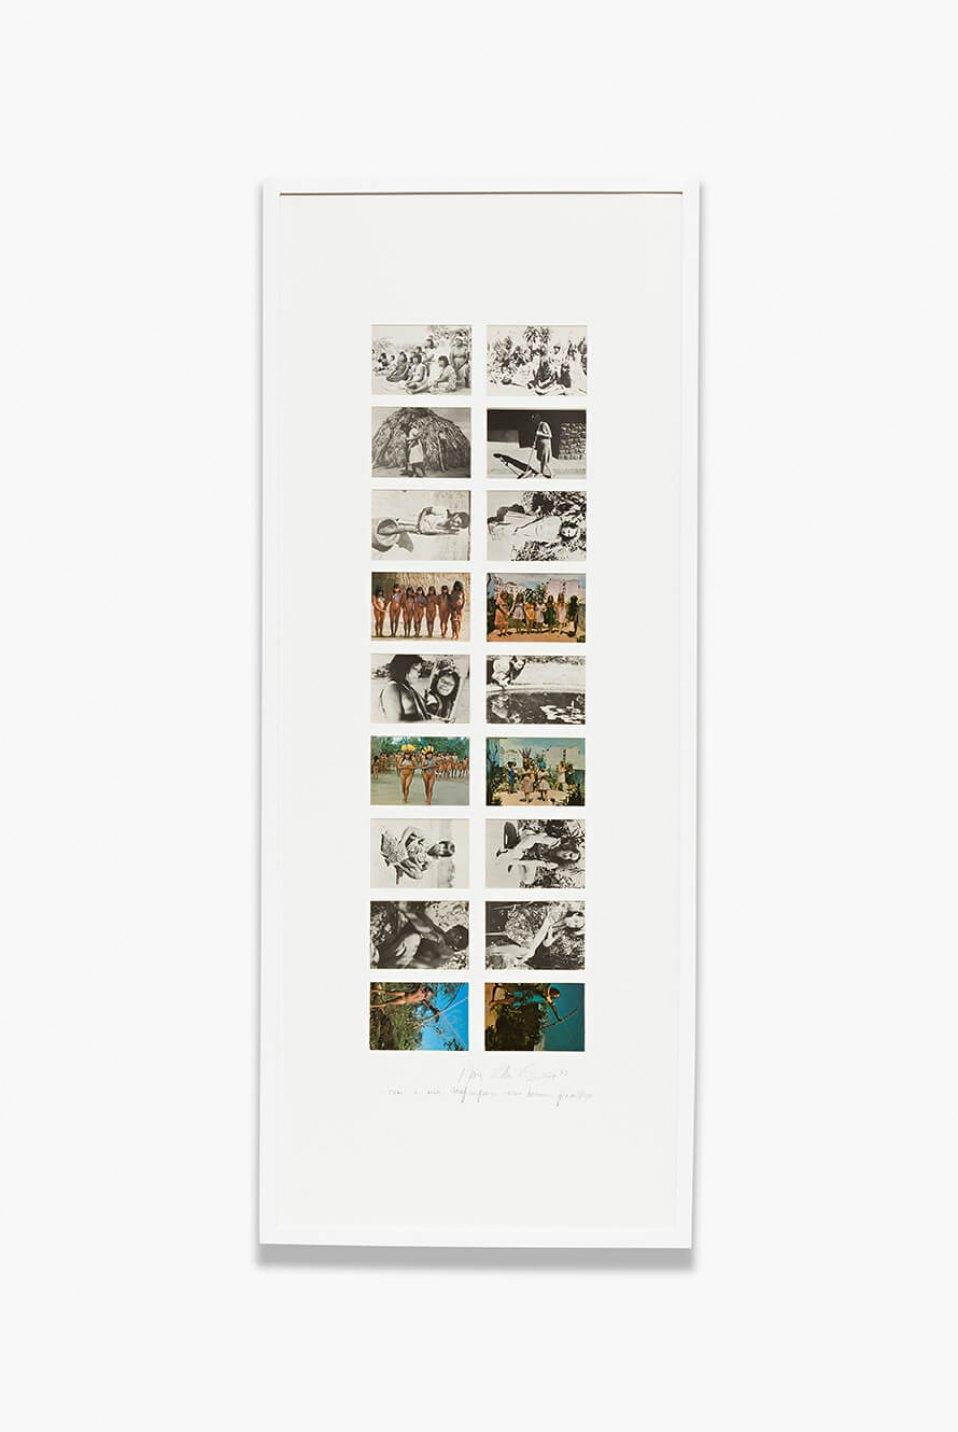 Anna Bella Geiger,&nbsp;<em>Brasil nativo – Brasil alienígena</em>, 1977,&nbsp;18 postal cards series, 144 × 58 cm - Mendes Wood DM